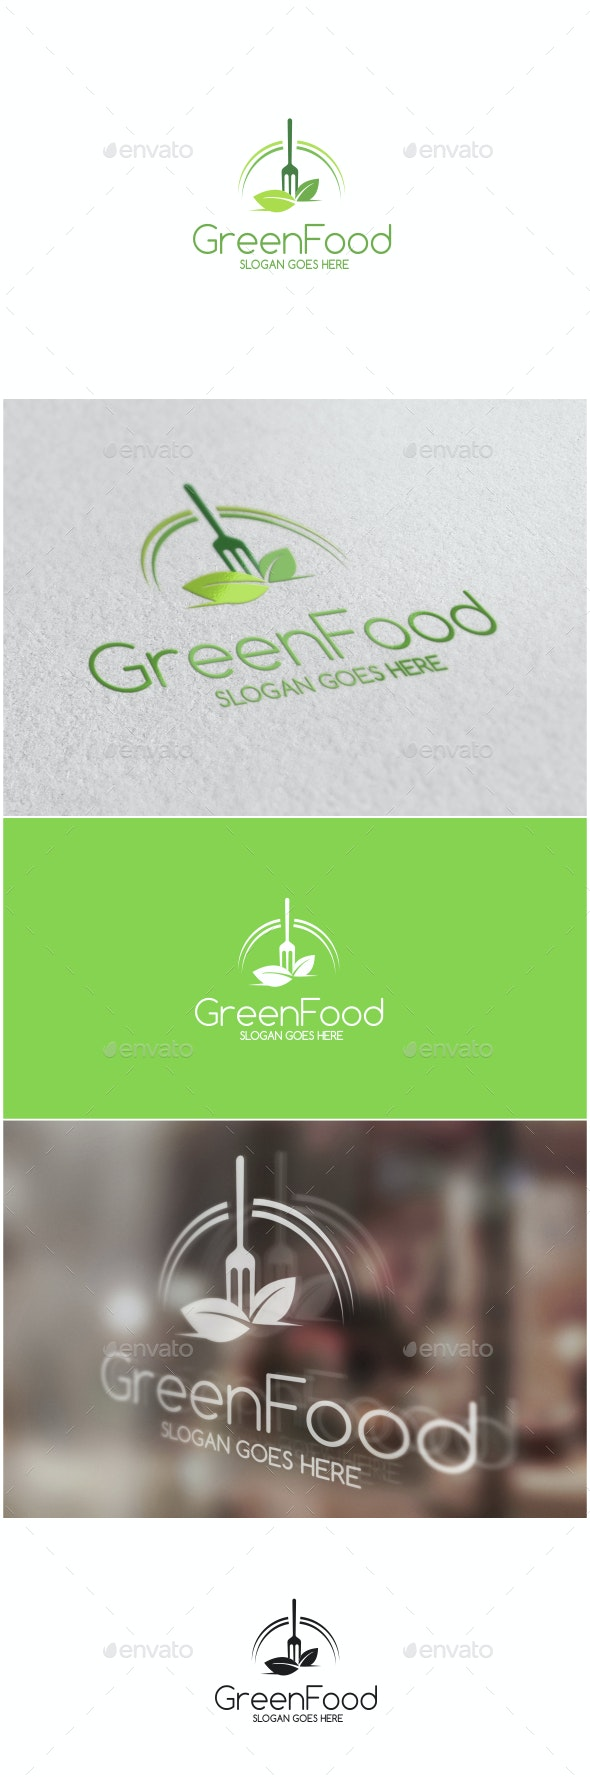 Green Food Logo - Food Logo Templates